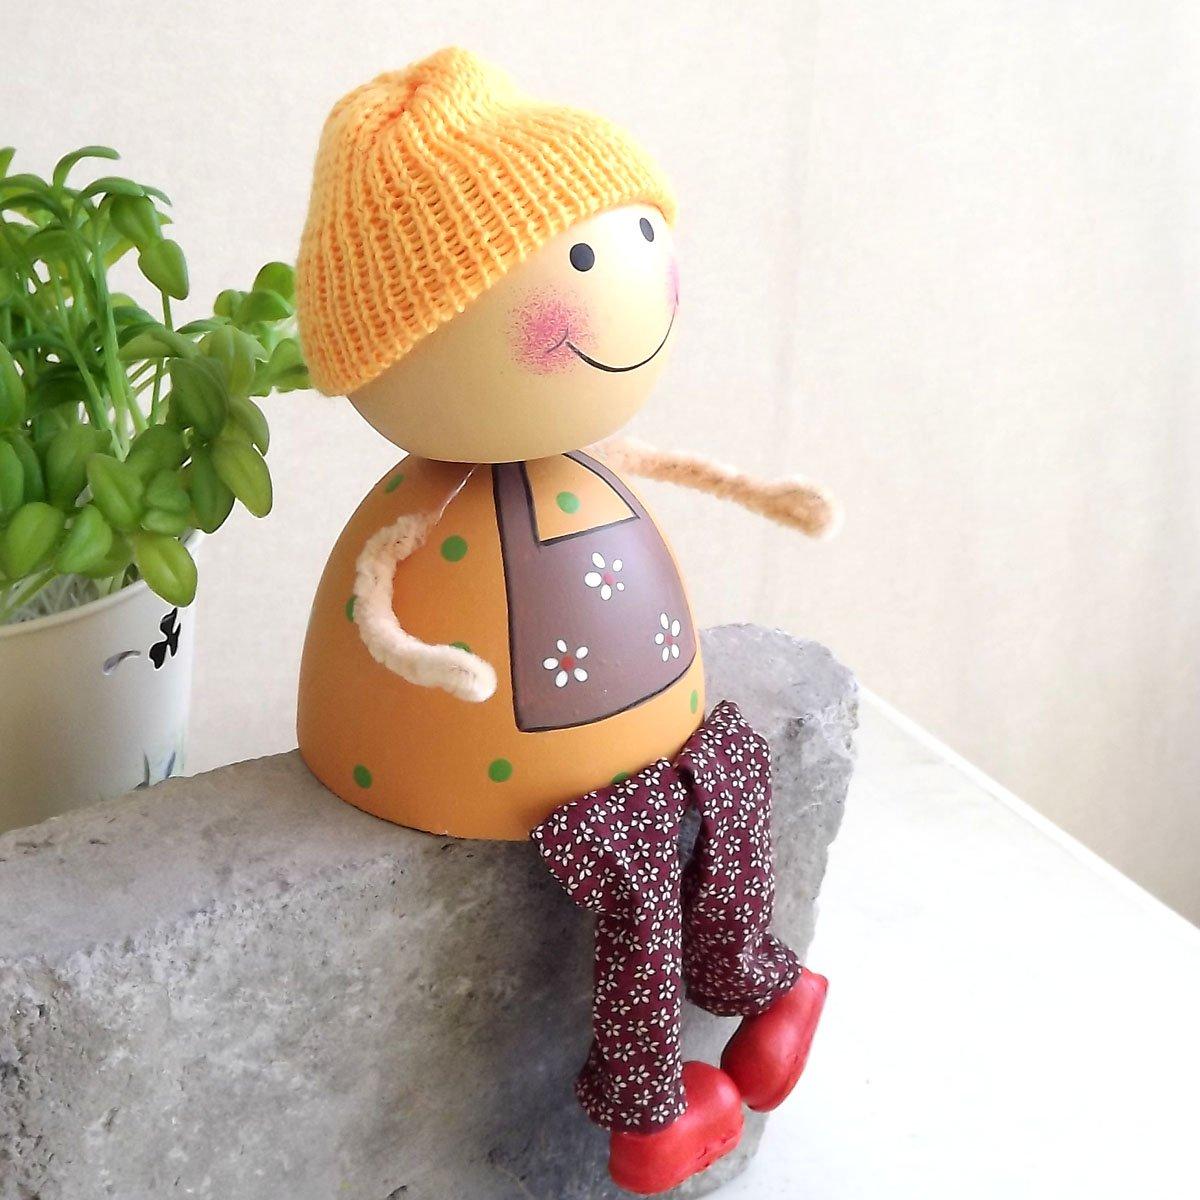 nhanc 侬家手工 田园卡通情侣小娃娃家居装饰摆件纯手工木制娃娃摆设